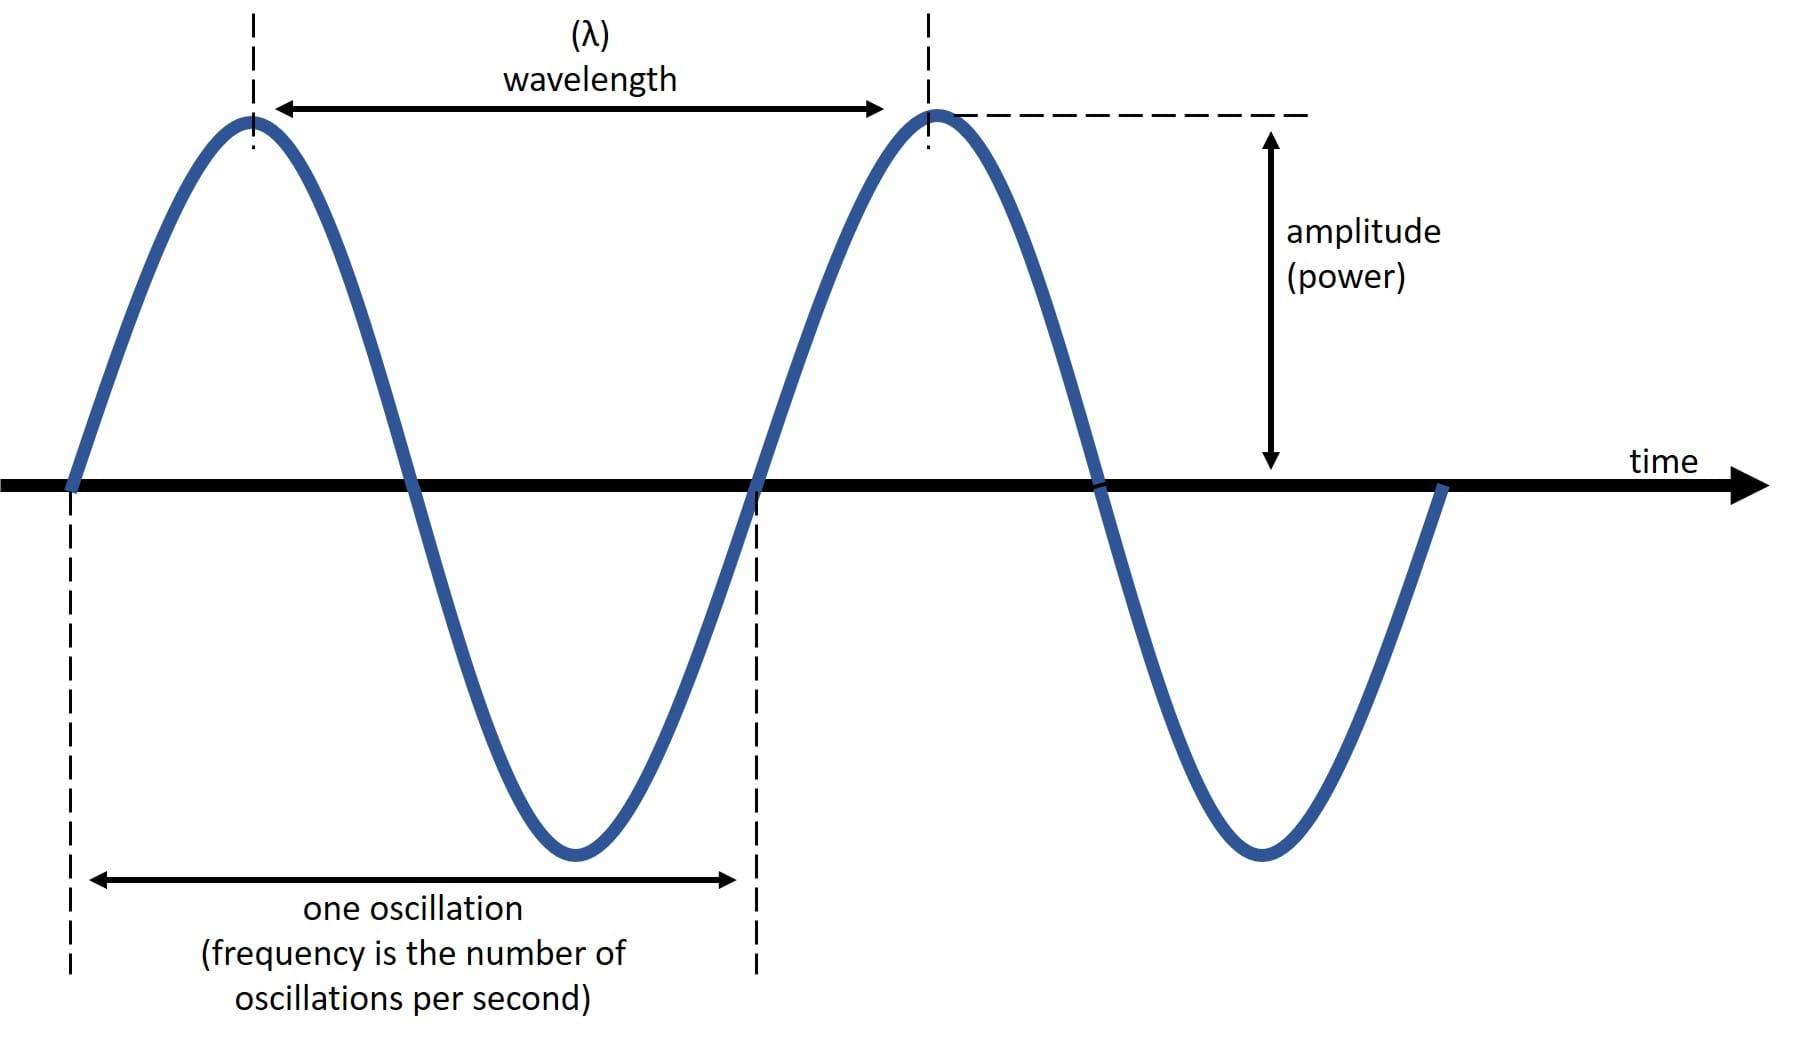 Worksheet Labeling Waves Key